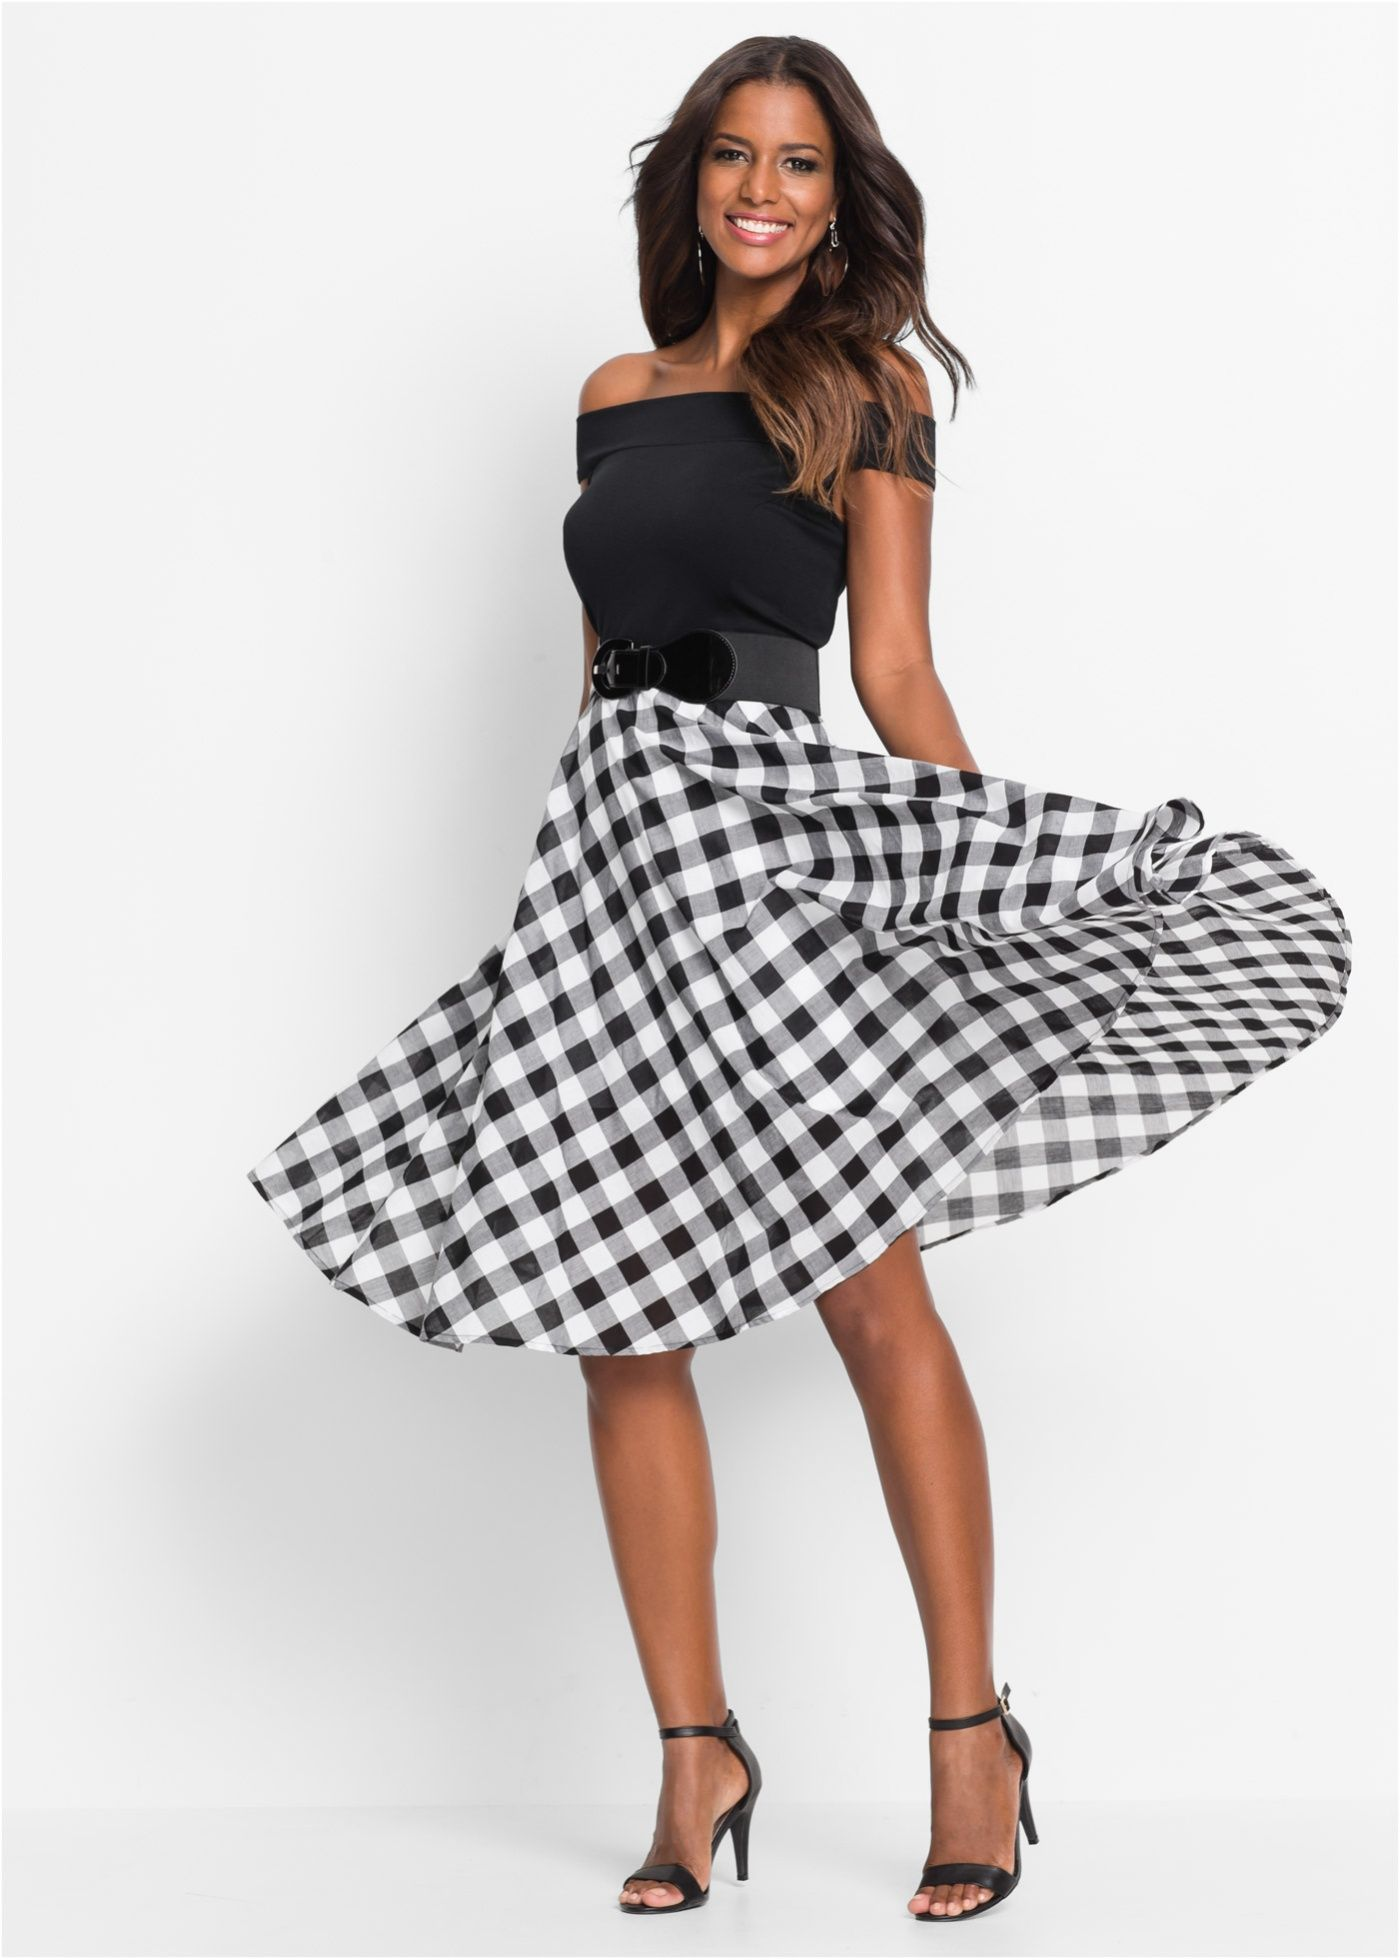 Feminines, schulterfreies Kleid im Fifties-Look